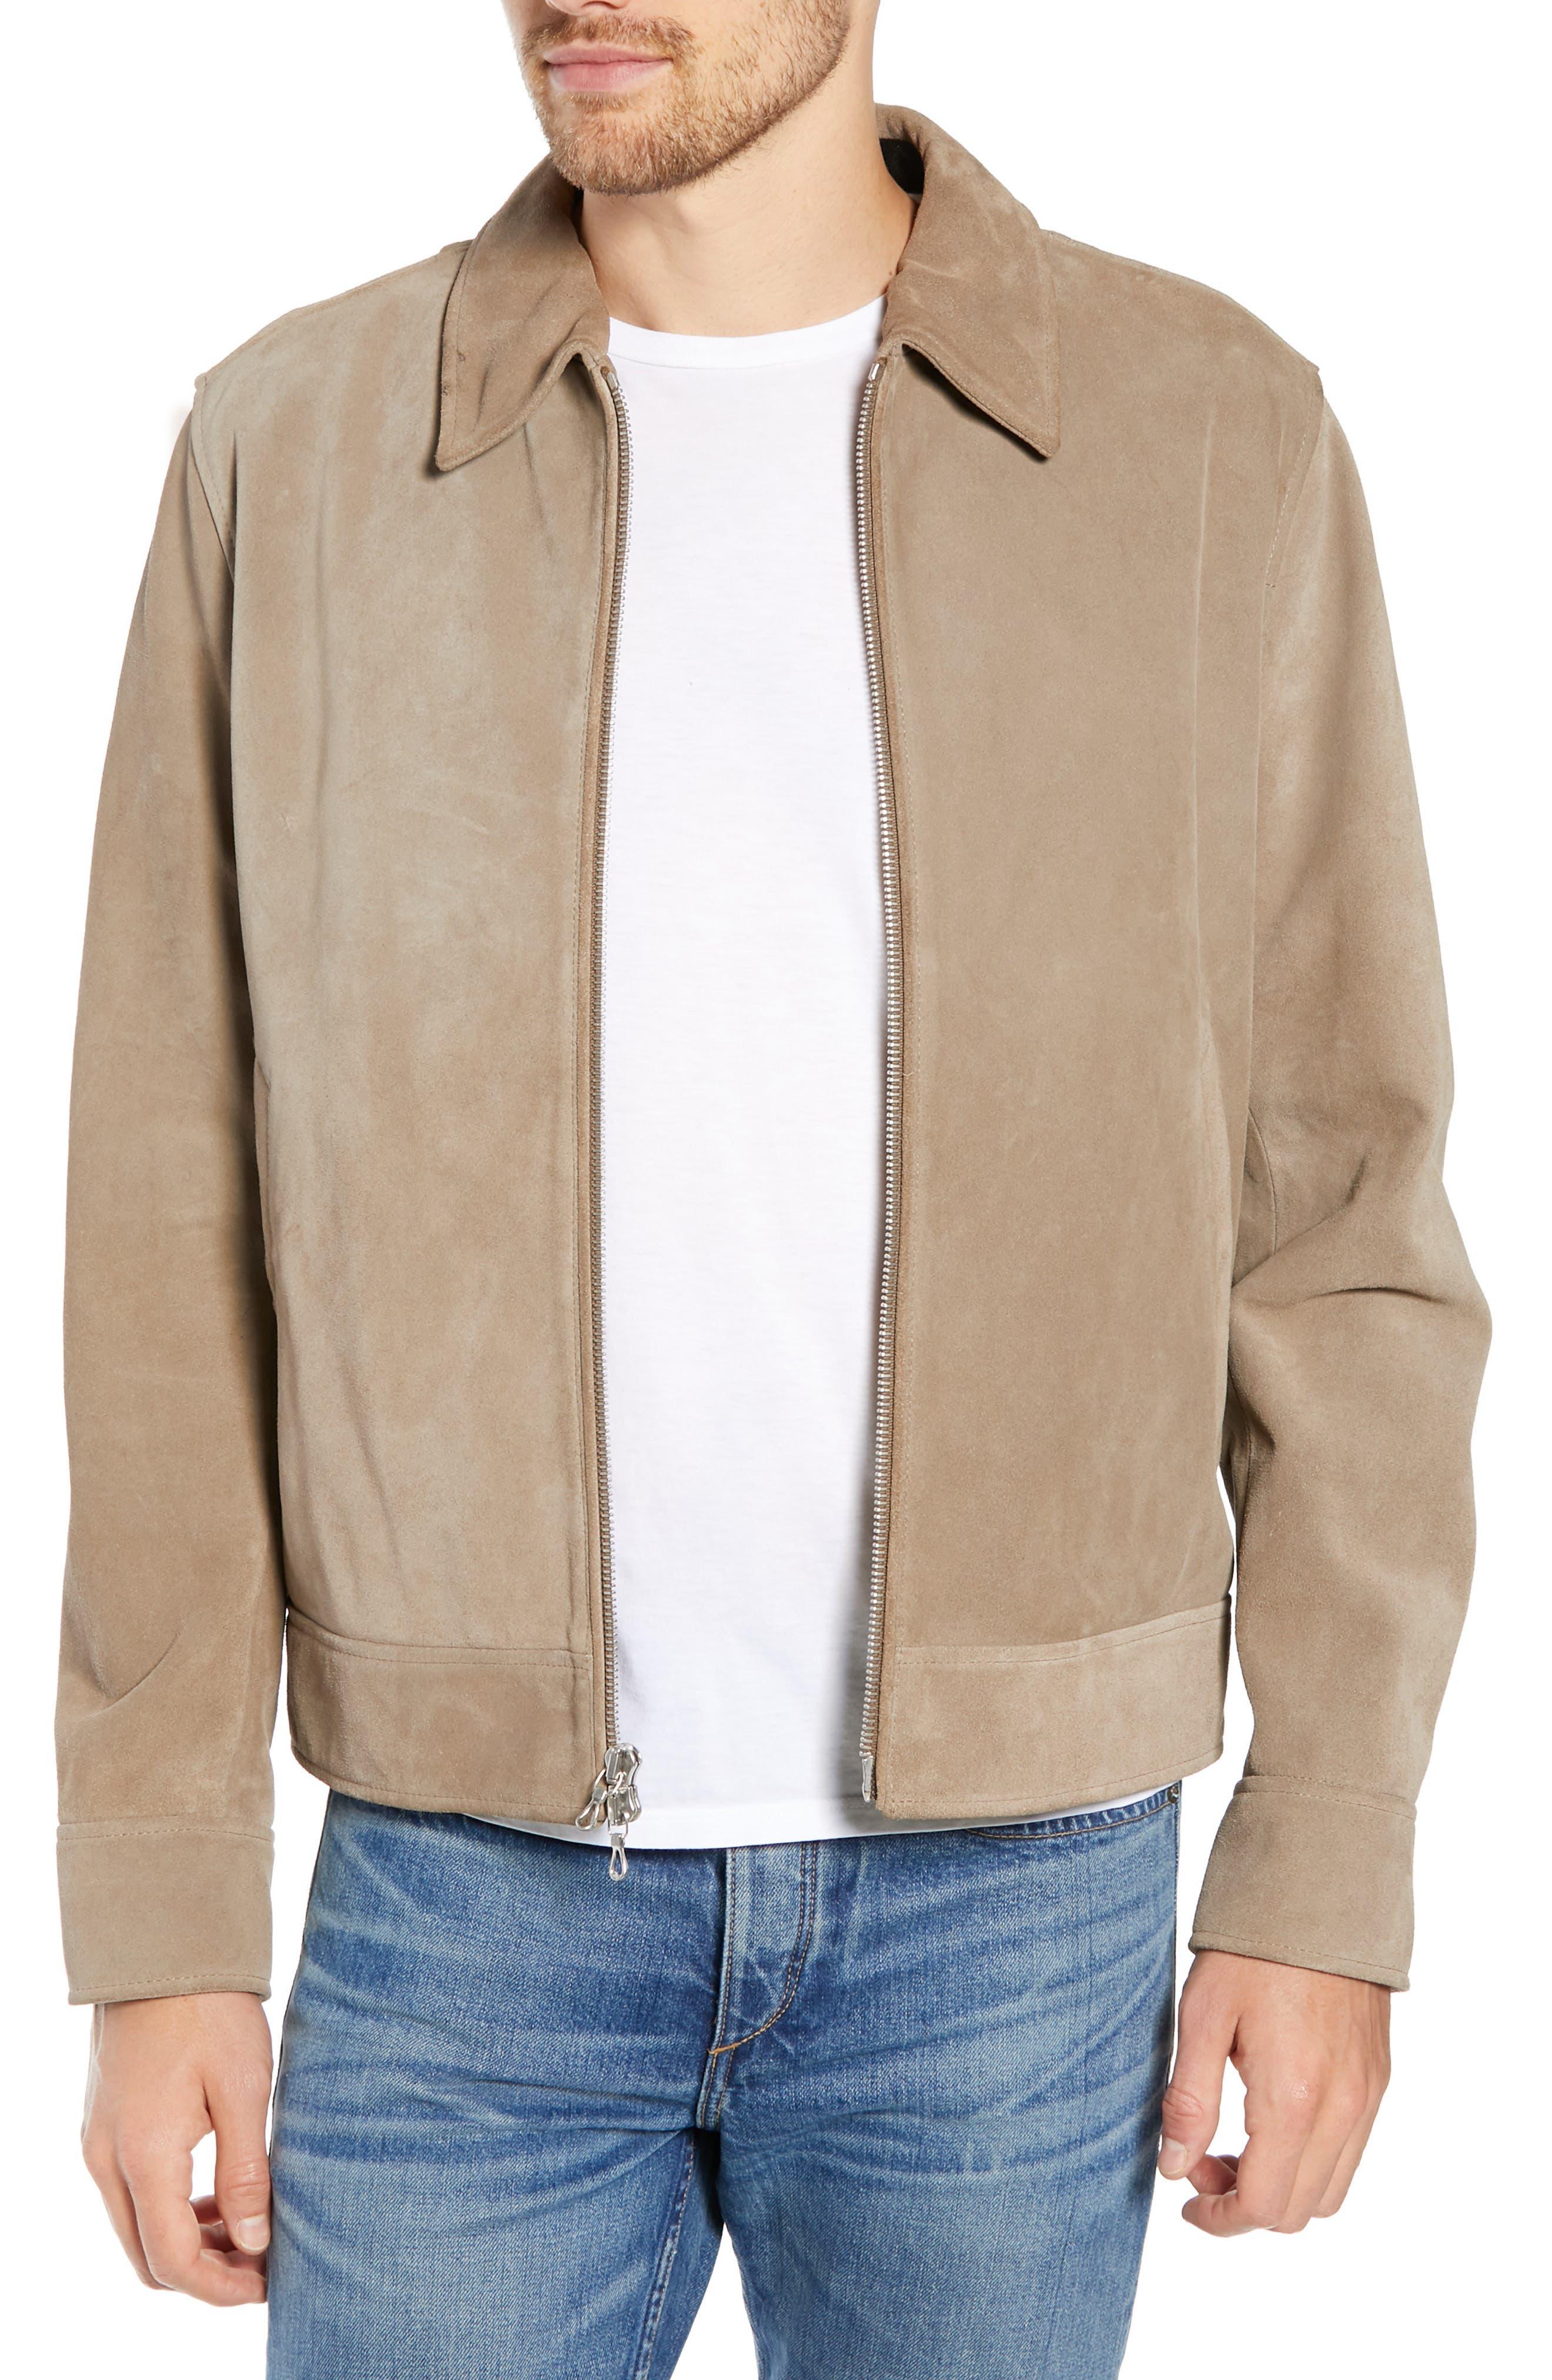 Rag & Bone Regular Fit Suede Garage Jacket